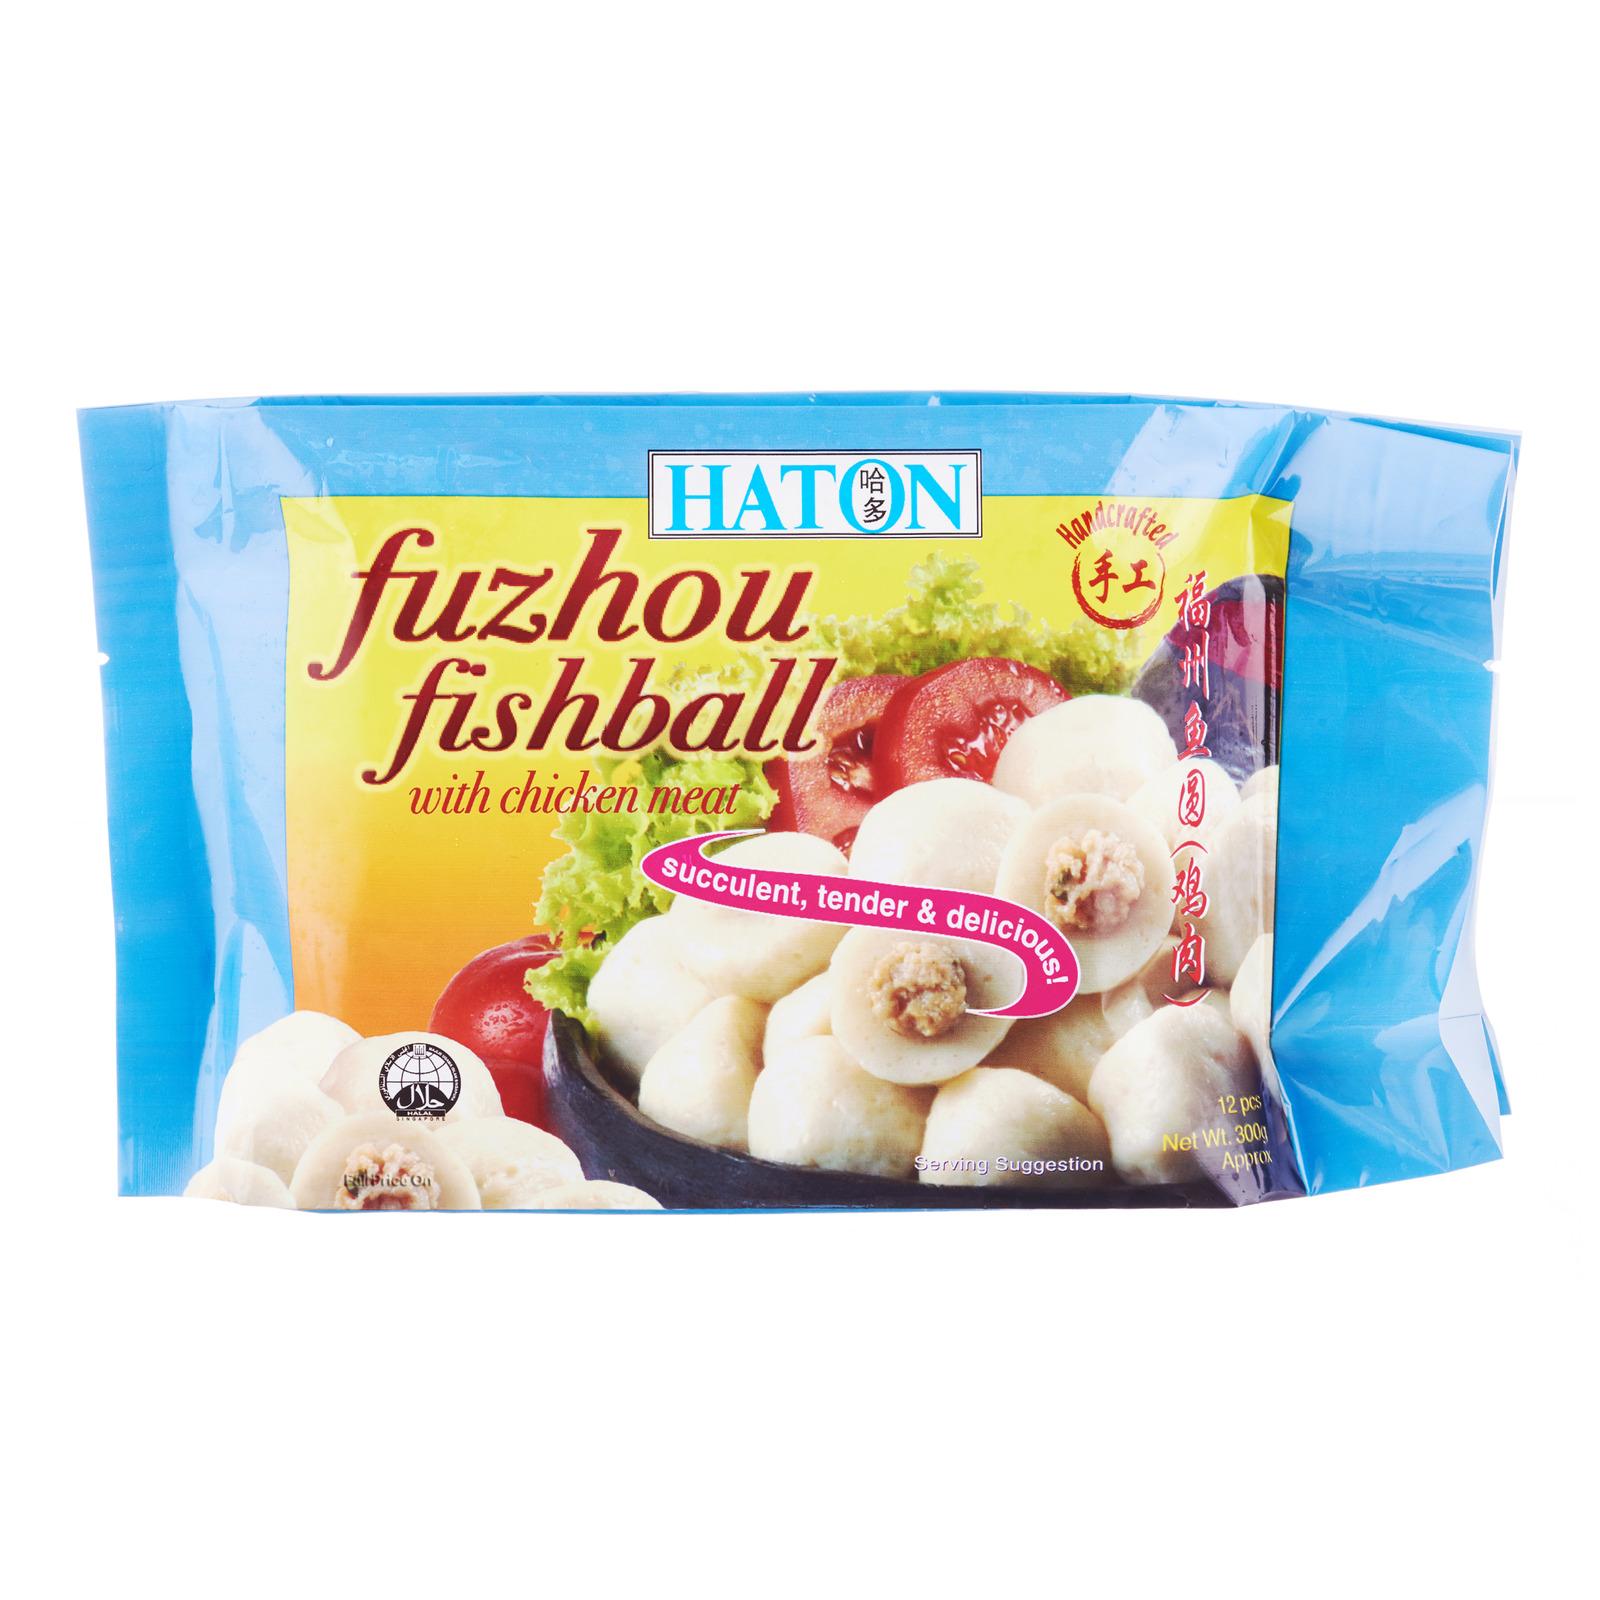 Haton Frozen Fuzhou Fishball with Chicken Meat